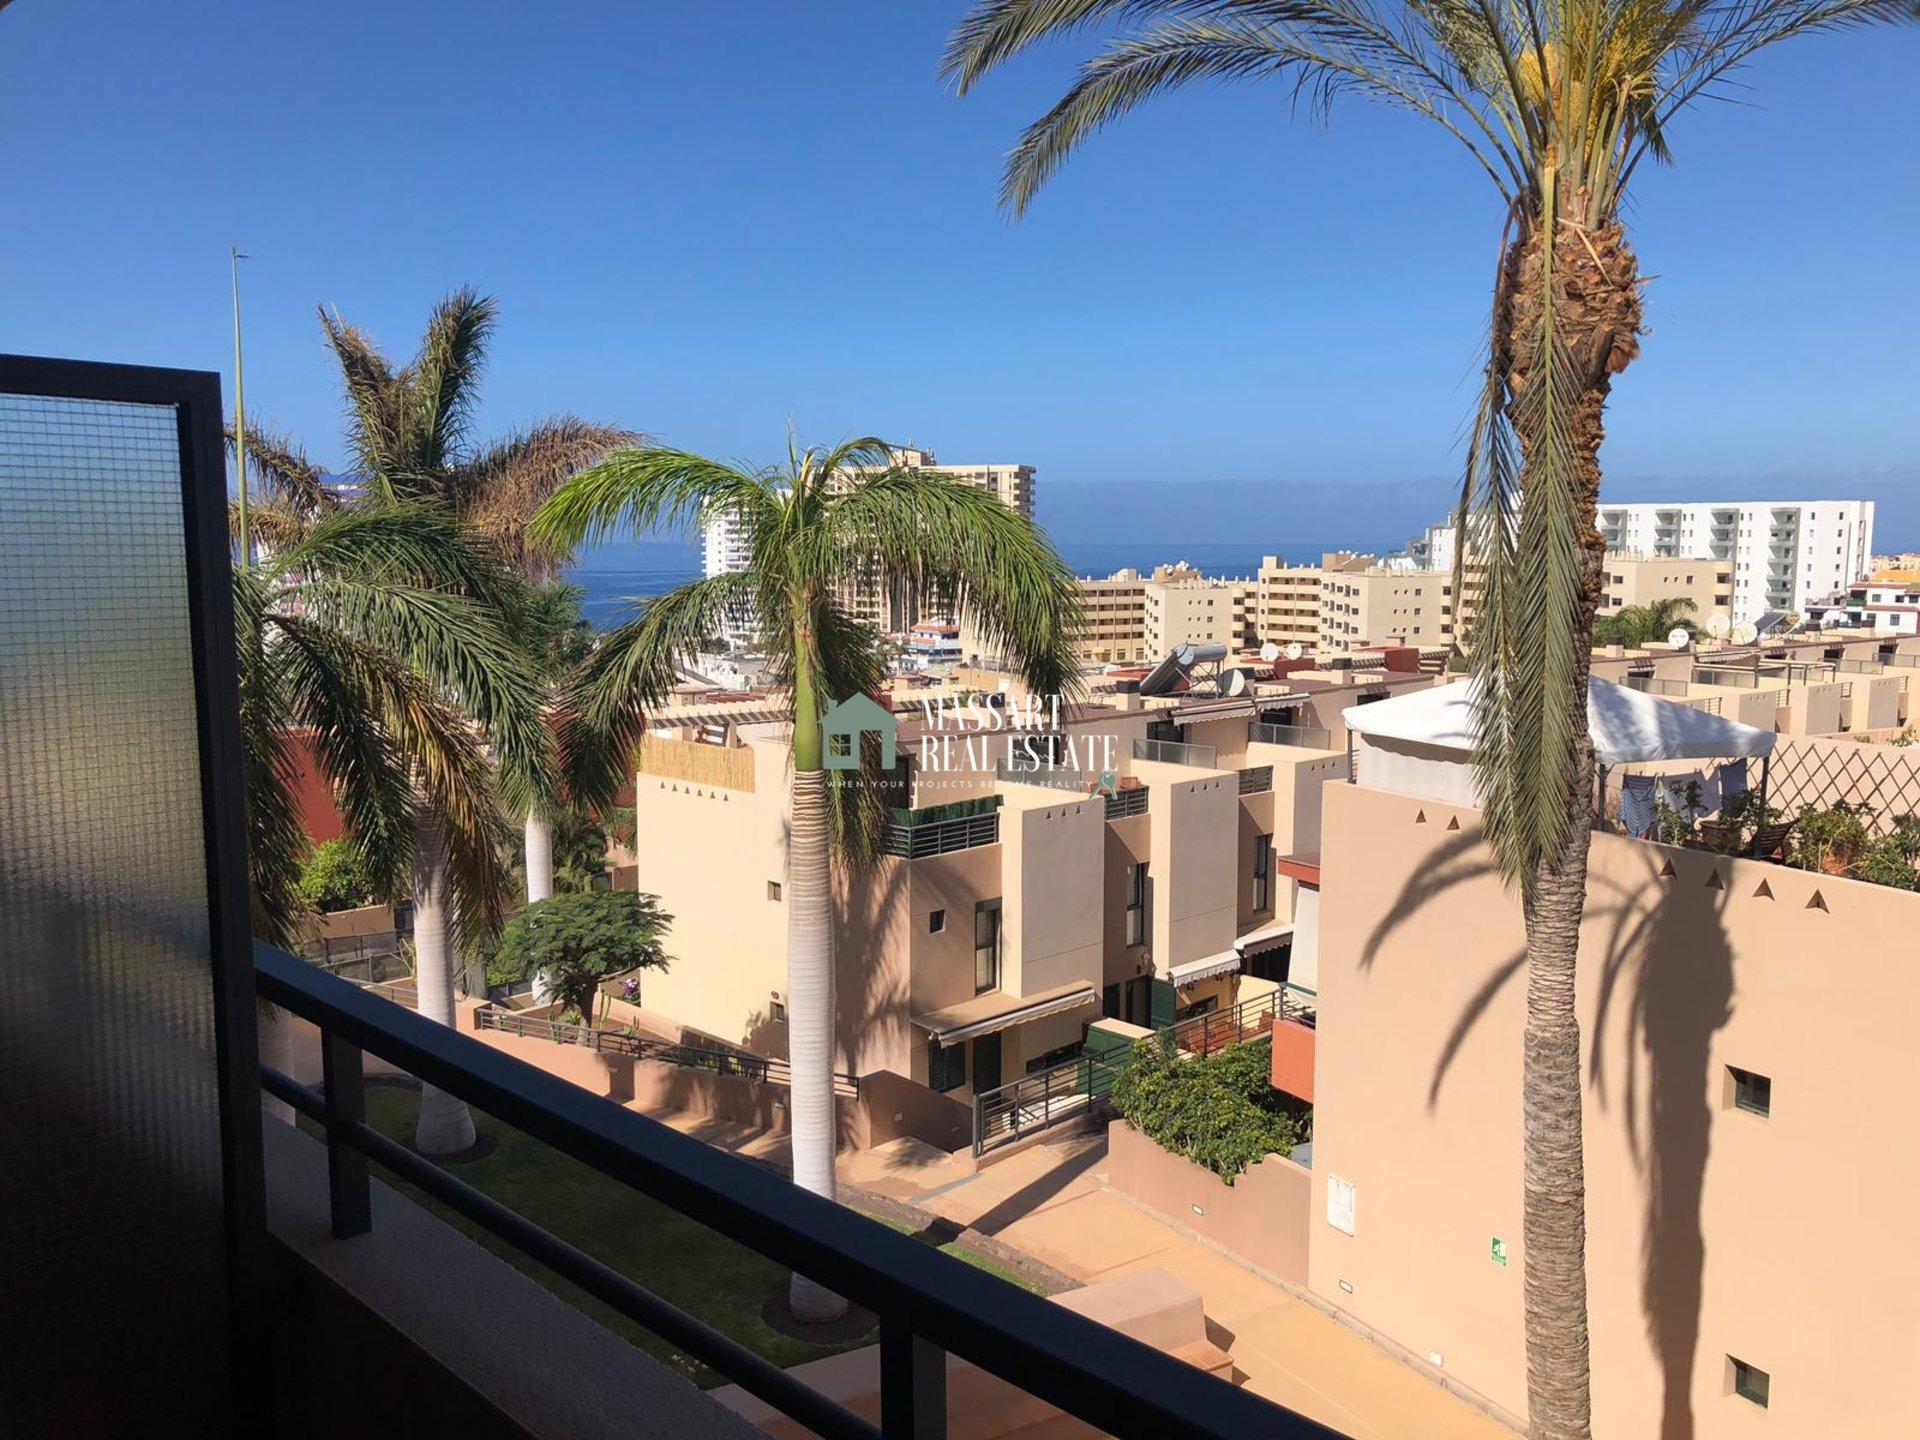 Appartamento completamente arredato in affitto a Playa Paraíso (Paraíso II)… ideale per godersi una vita felice in coppia!